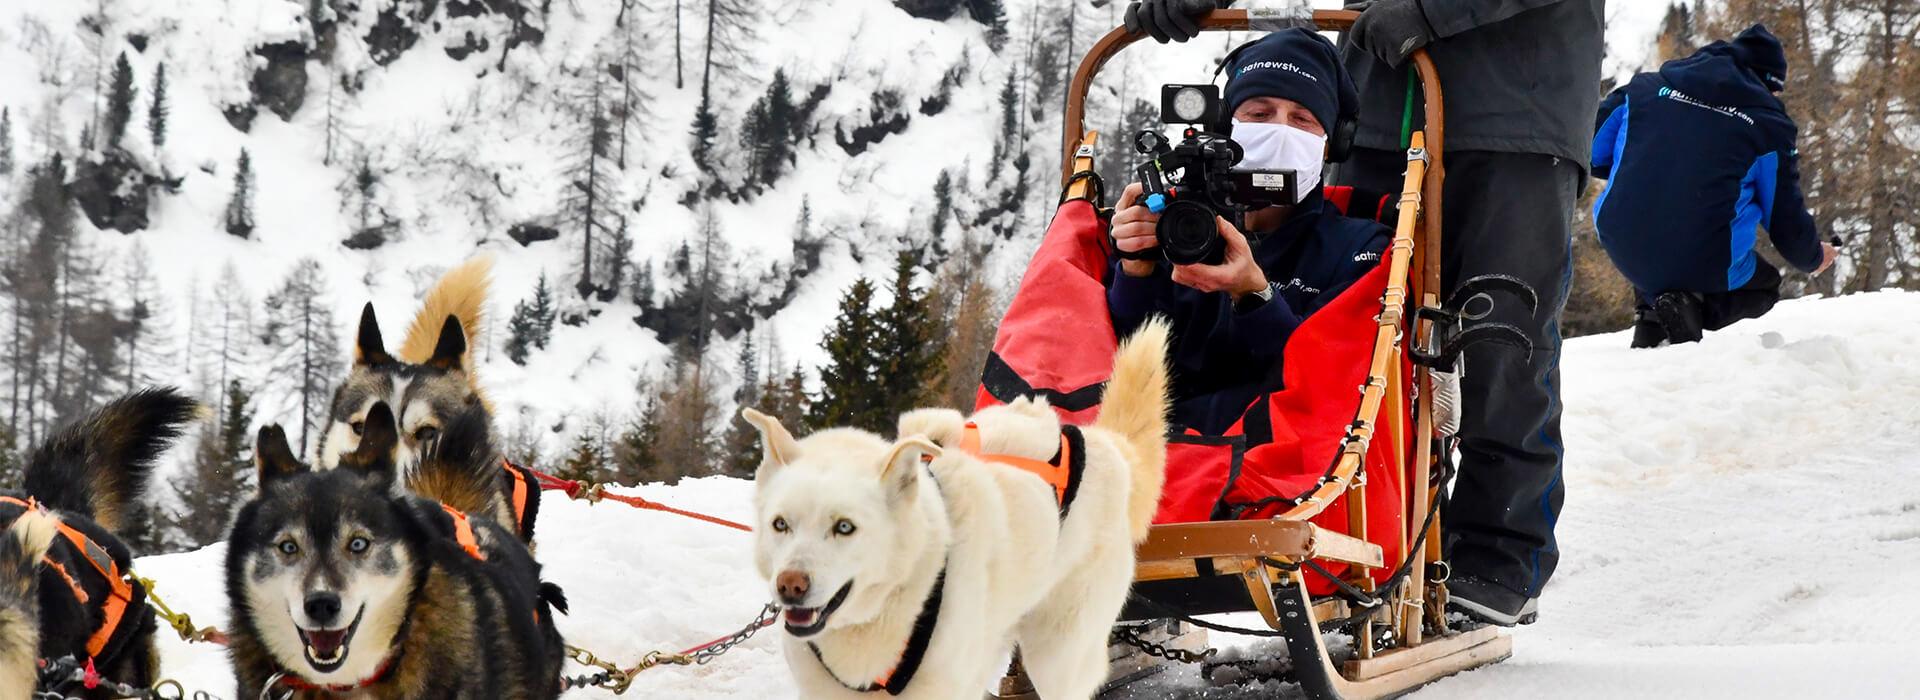 Husky experience con videmaker